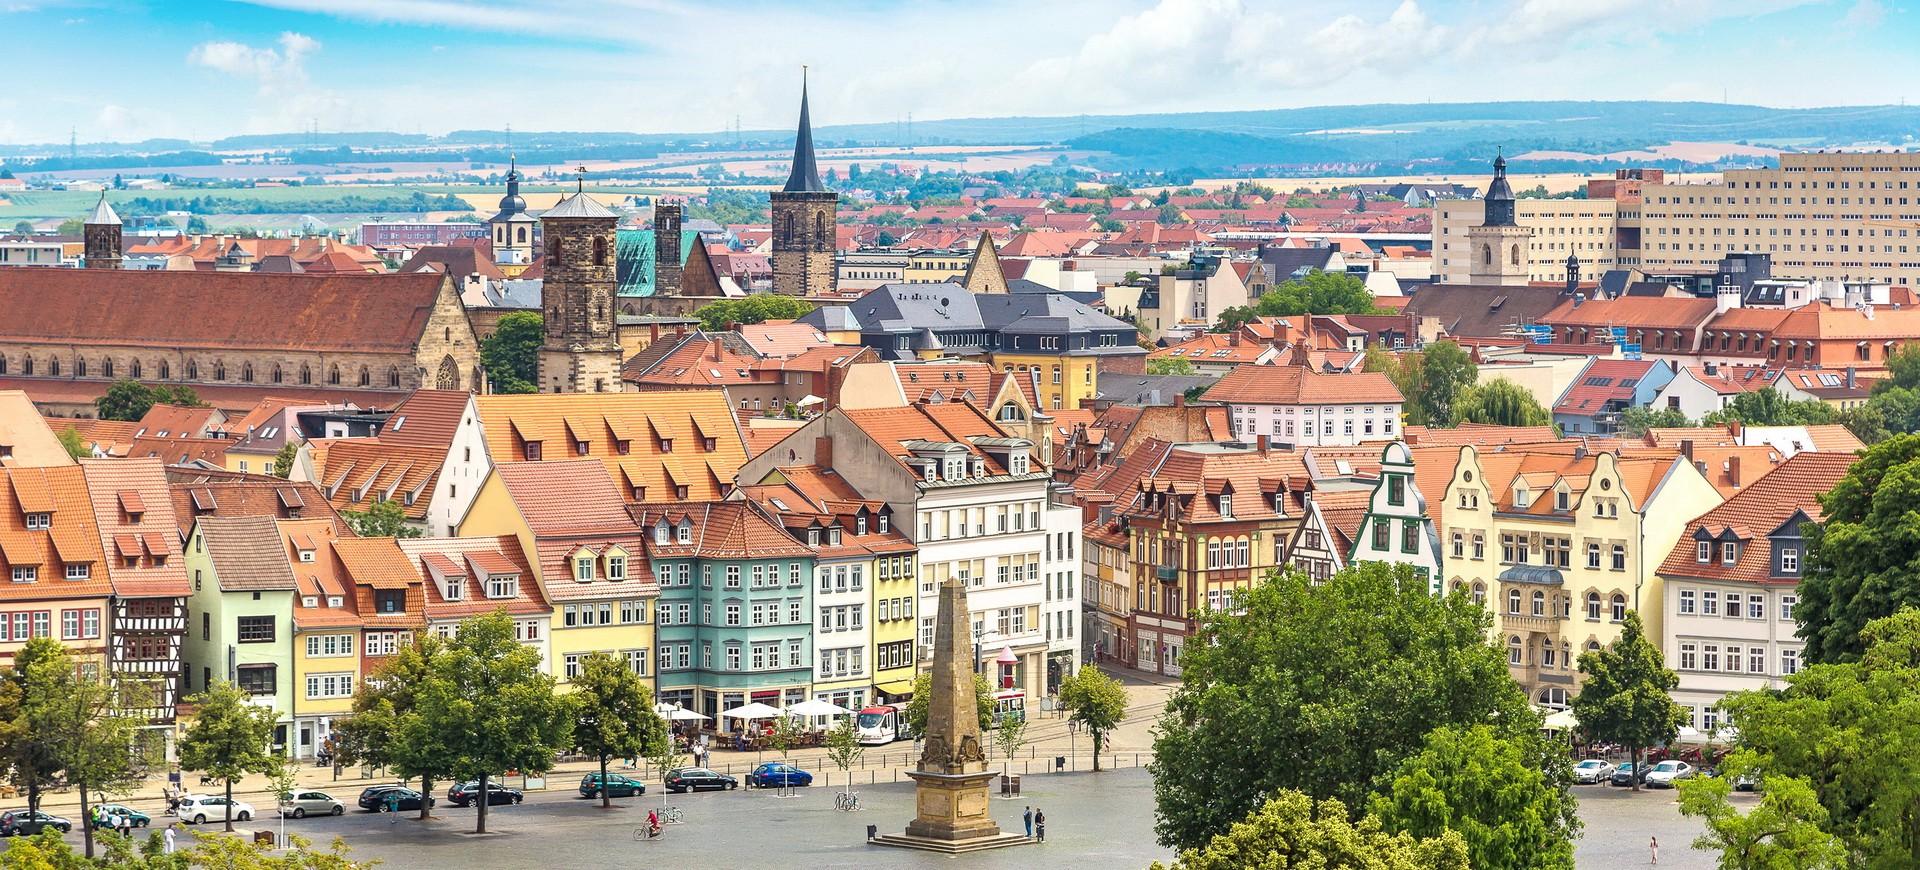 Erfurt en Allemagne